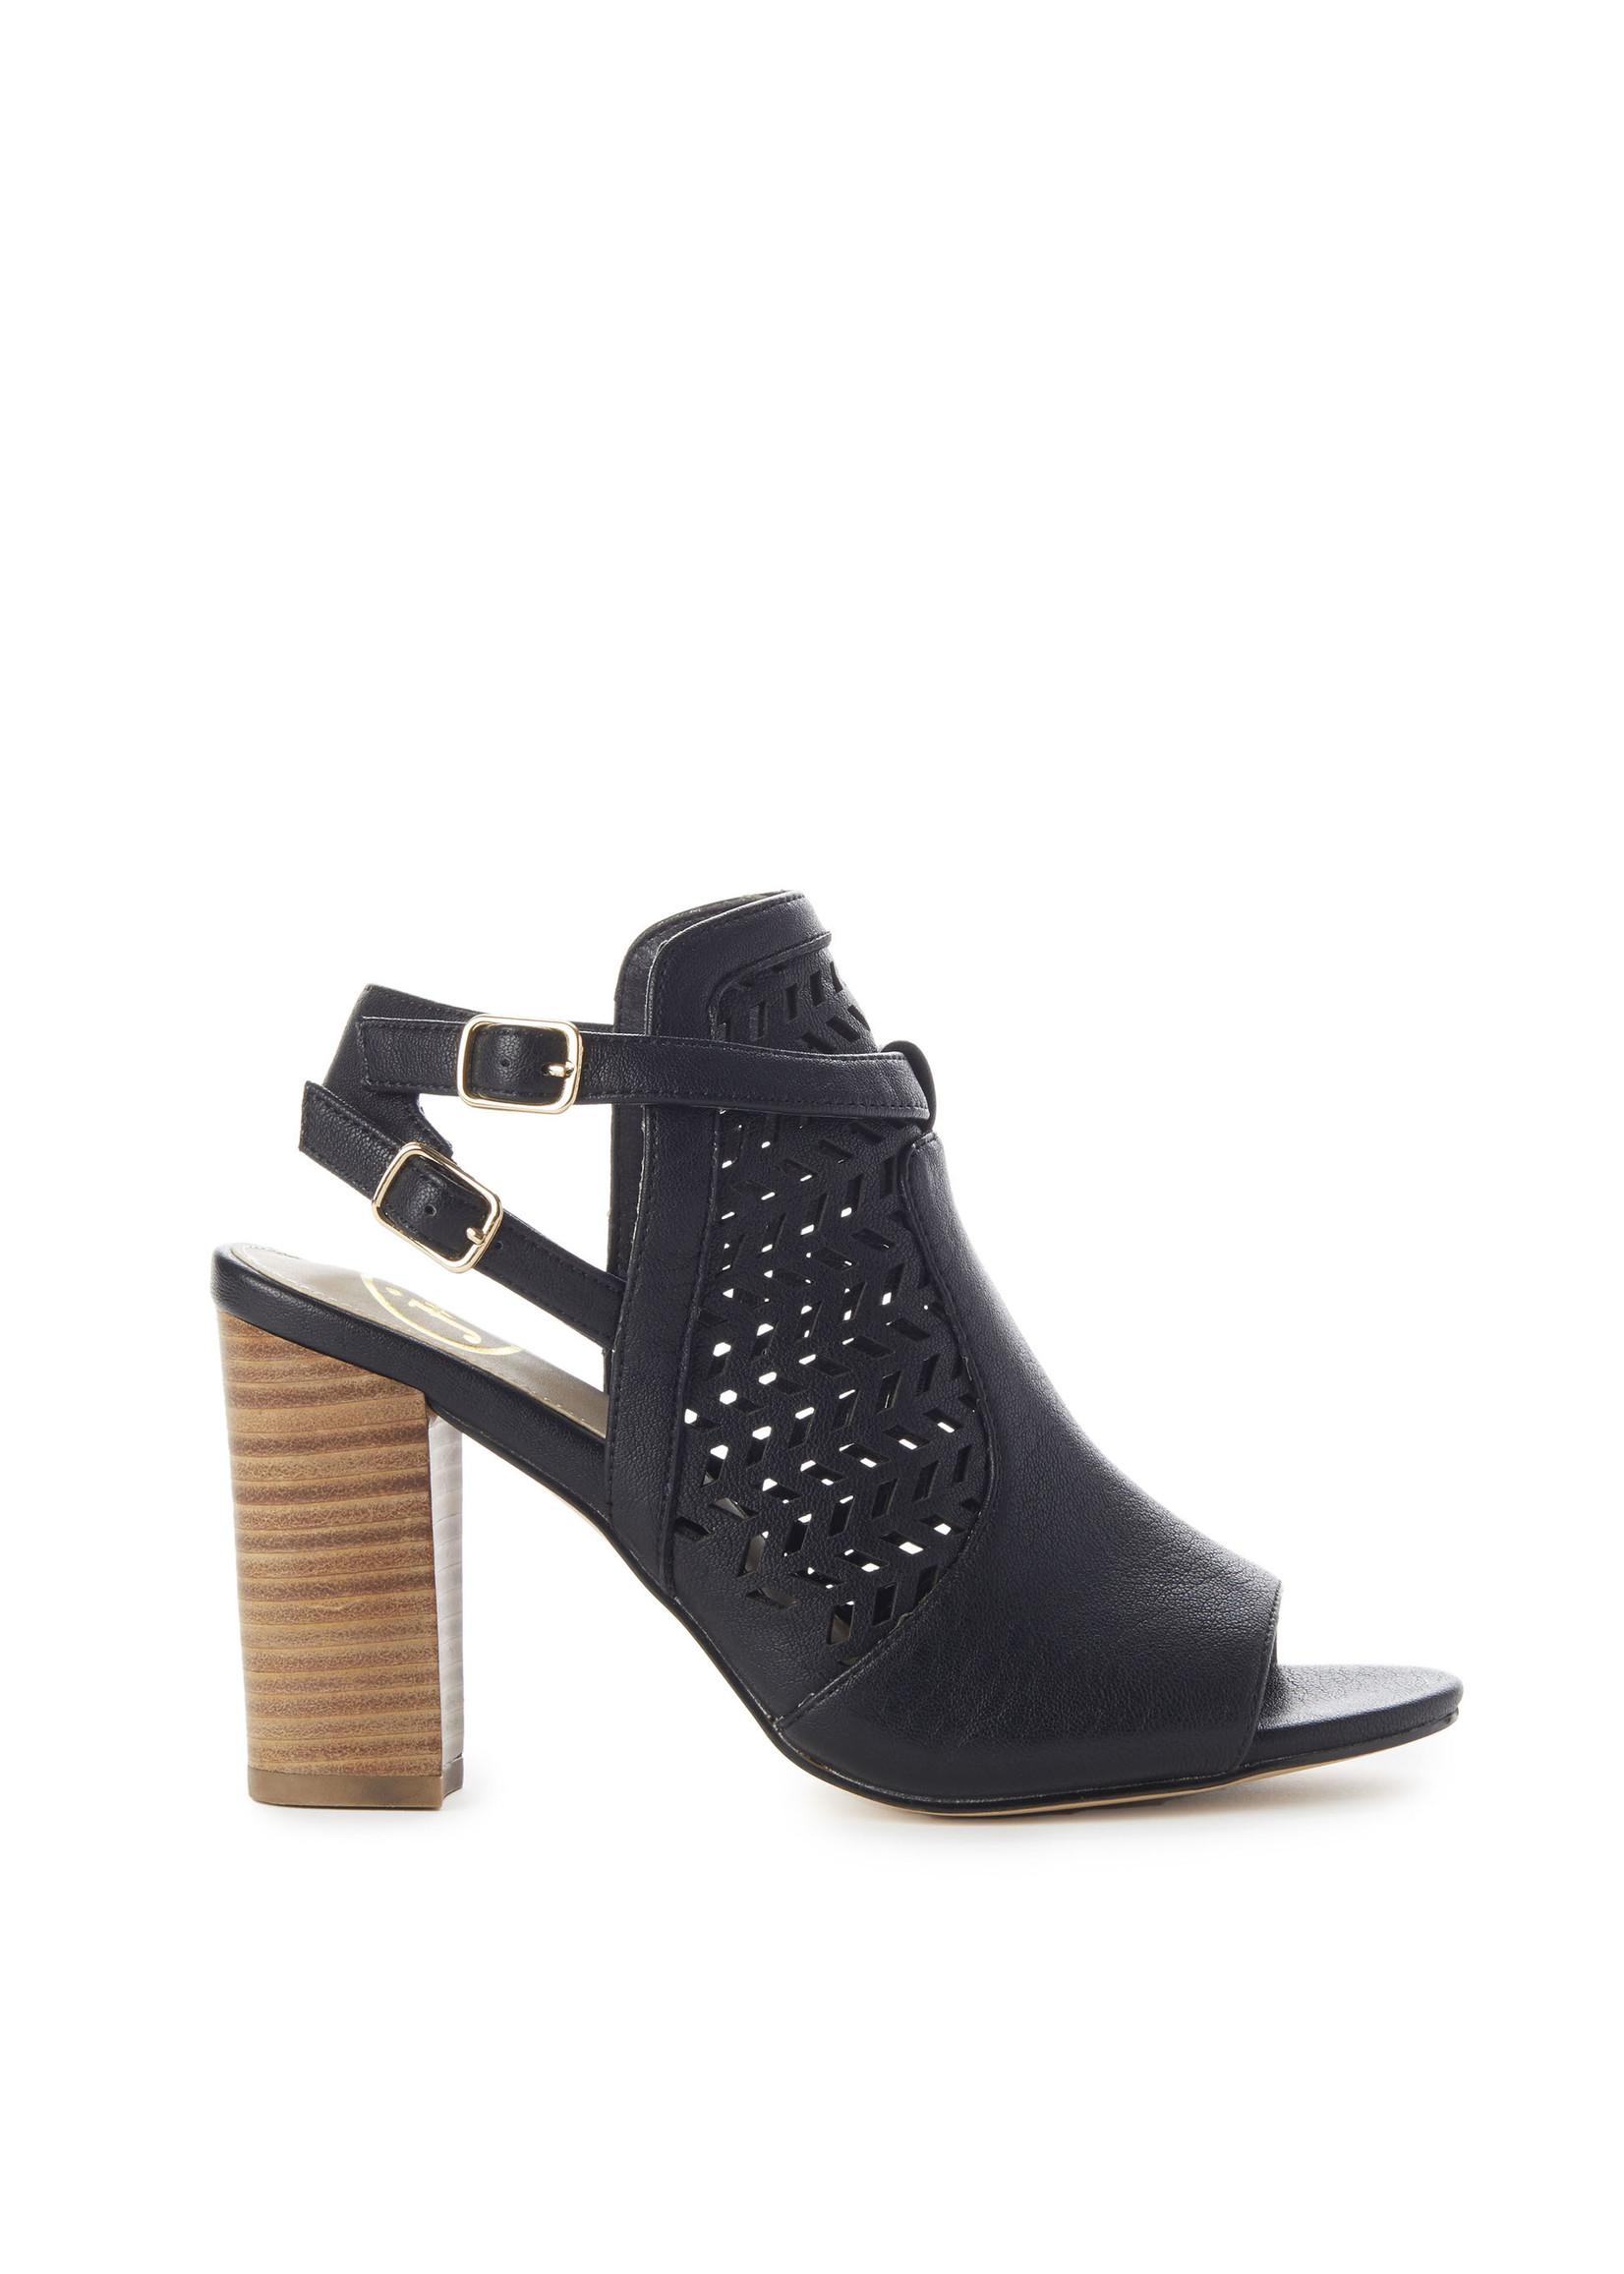 Jeane&Jax Kimberly - Perforated Stacked Heel